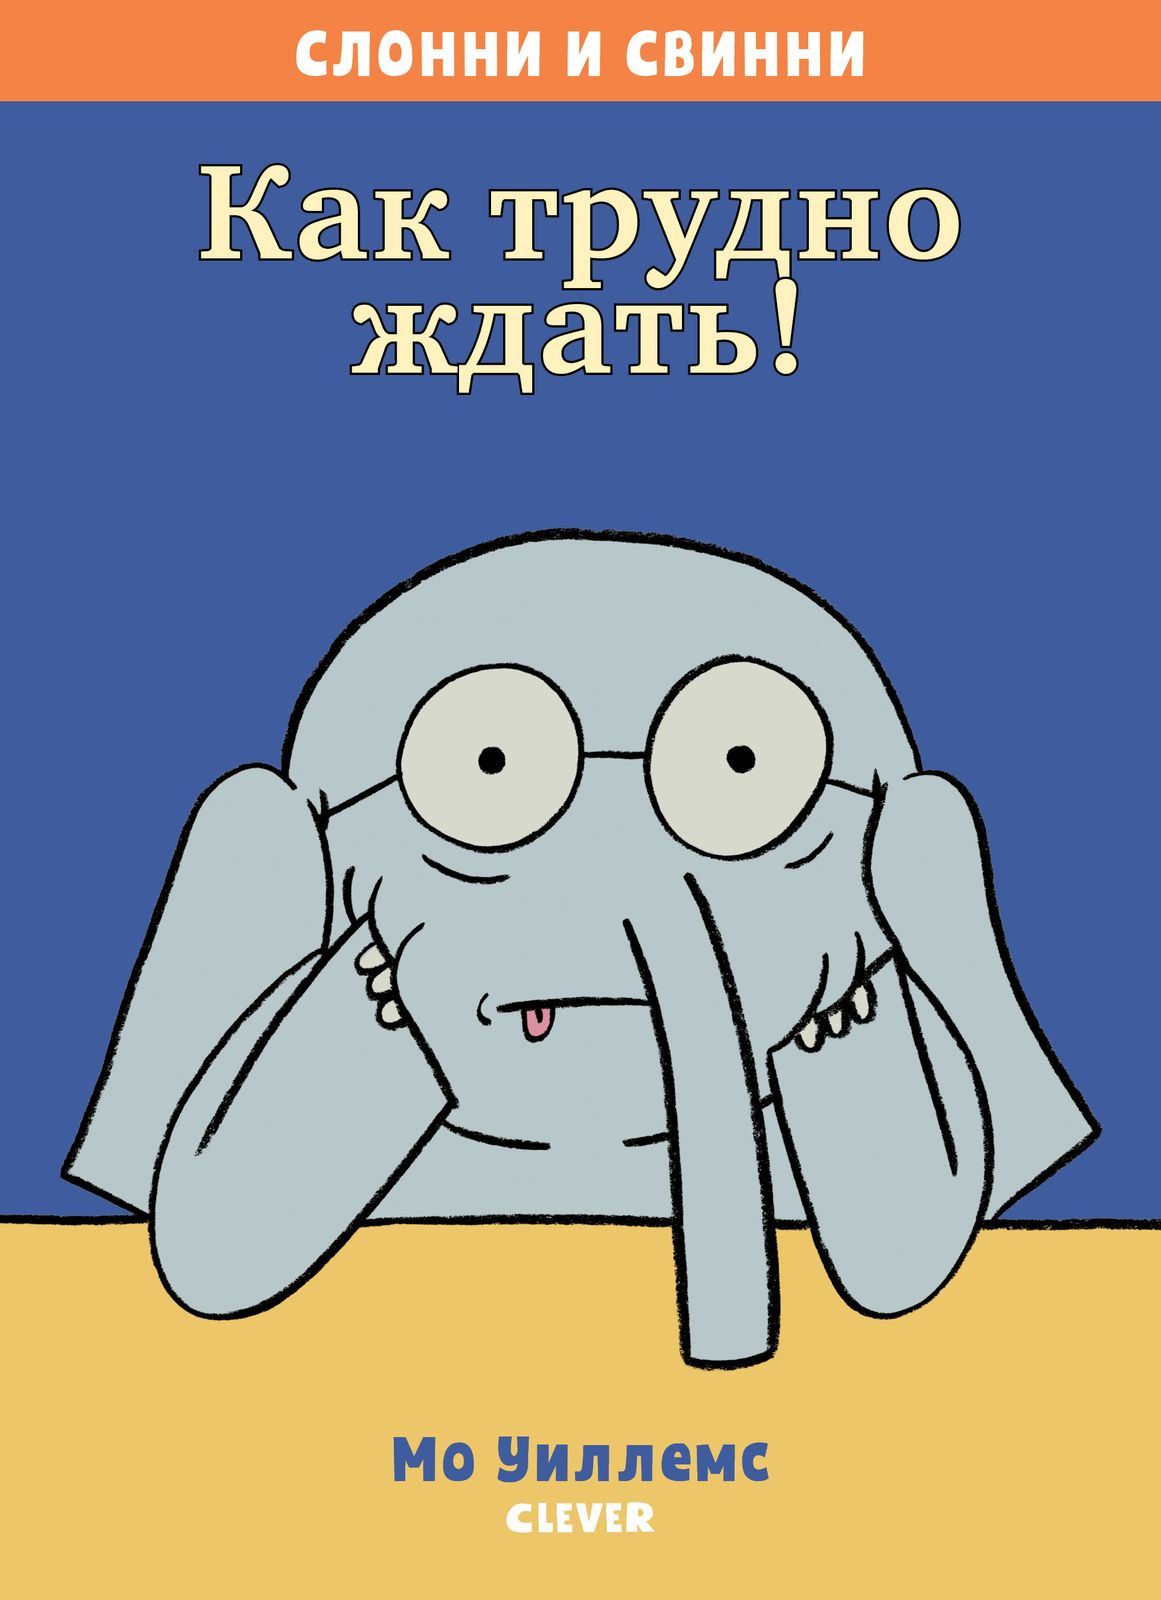 Слонни и Свинни. Как трудно ждать! фото